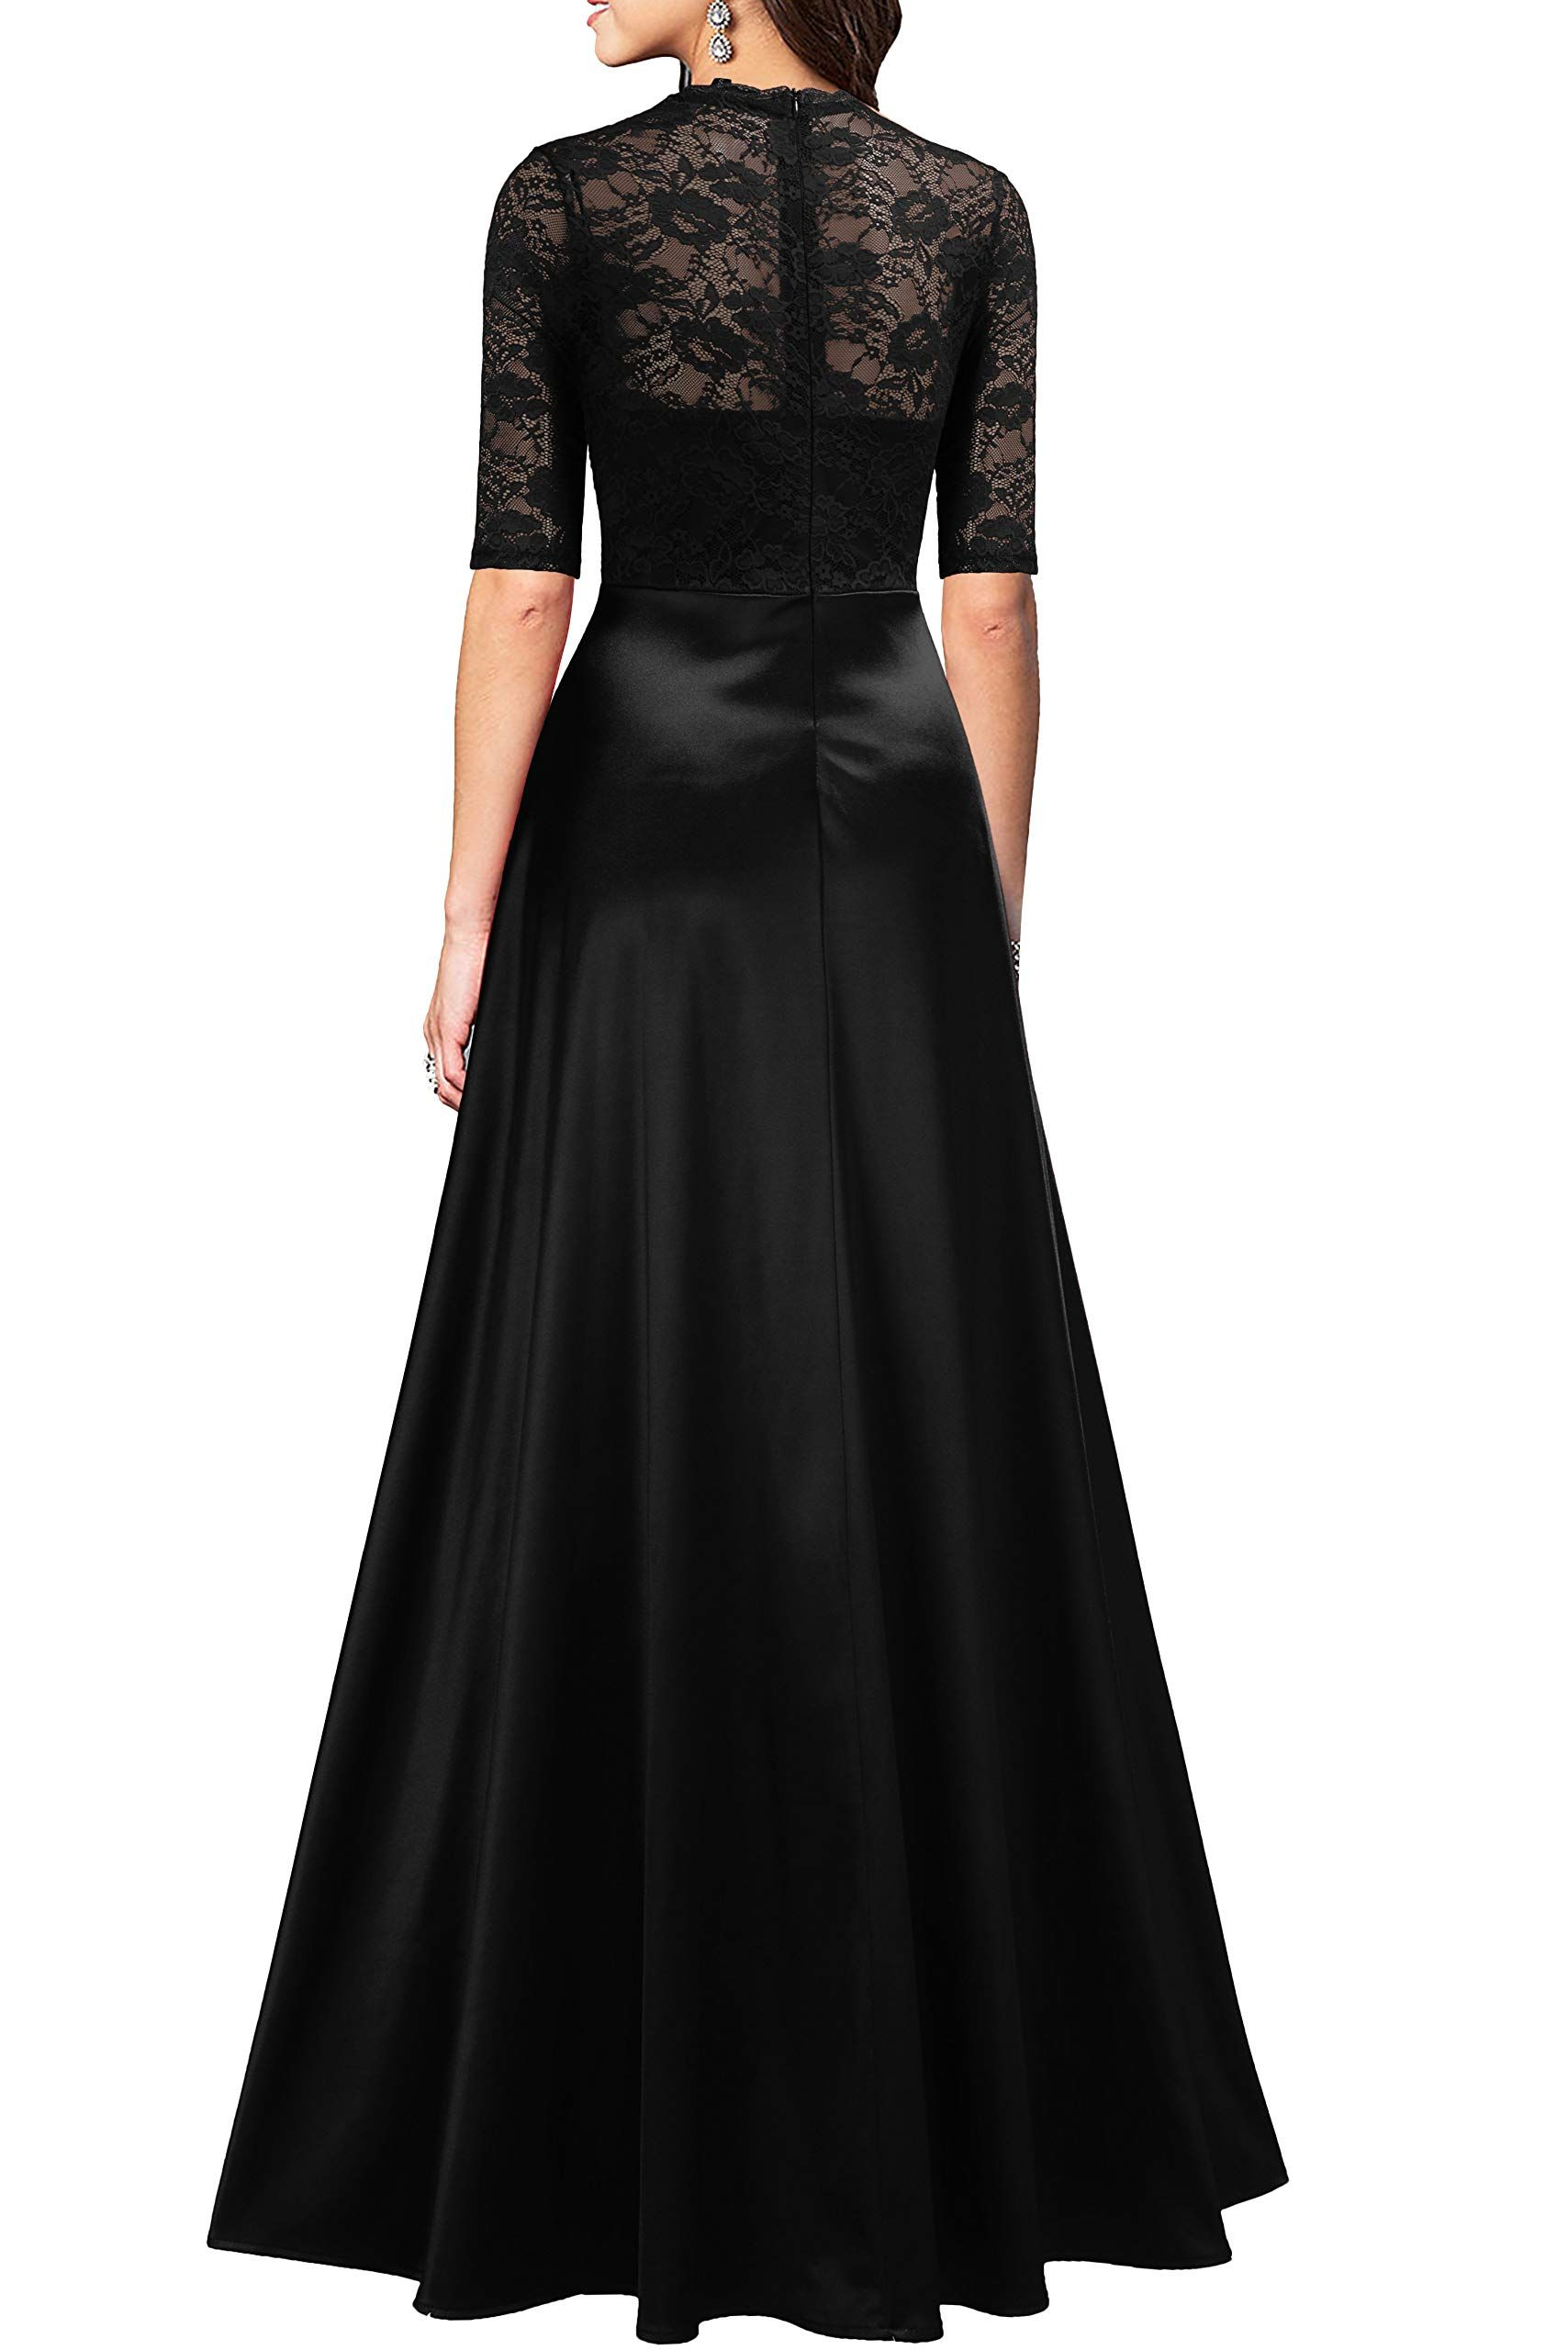 Mmondschein Vintage Wedding Bridesmaid Evening Evening Dresses Long Formal Dresses For Women Long Dress [ 2560 x 1708 Pixel ]